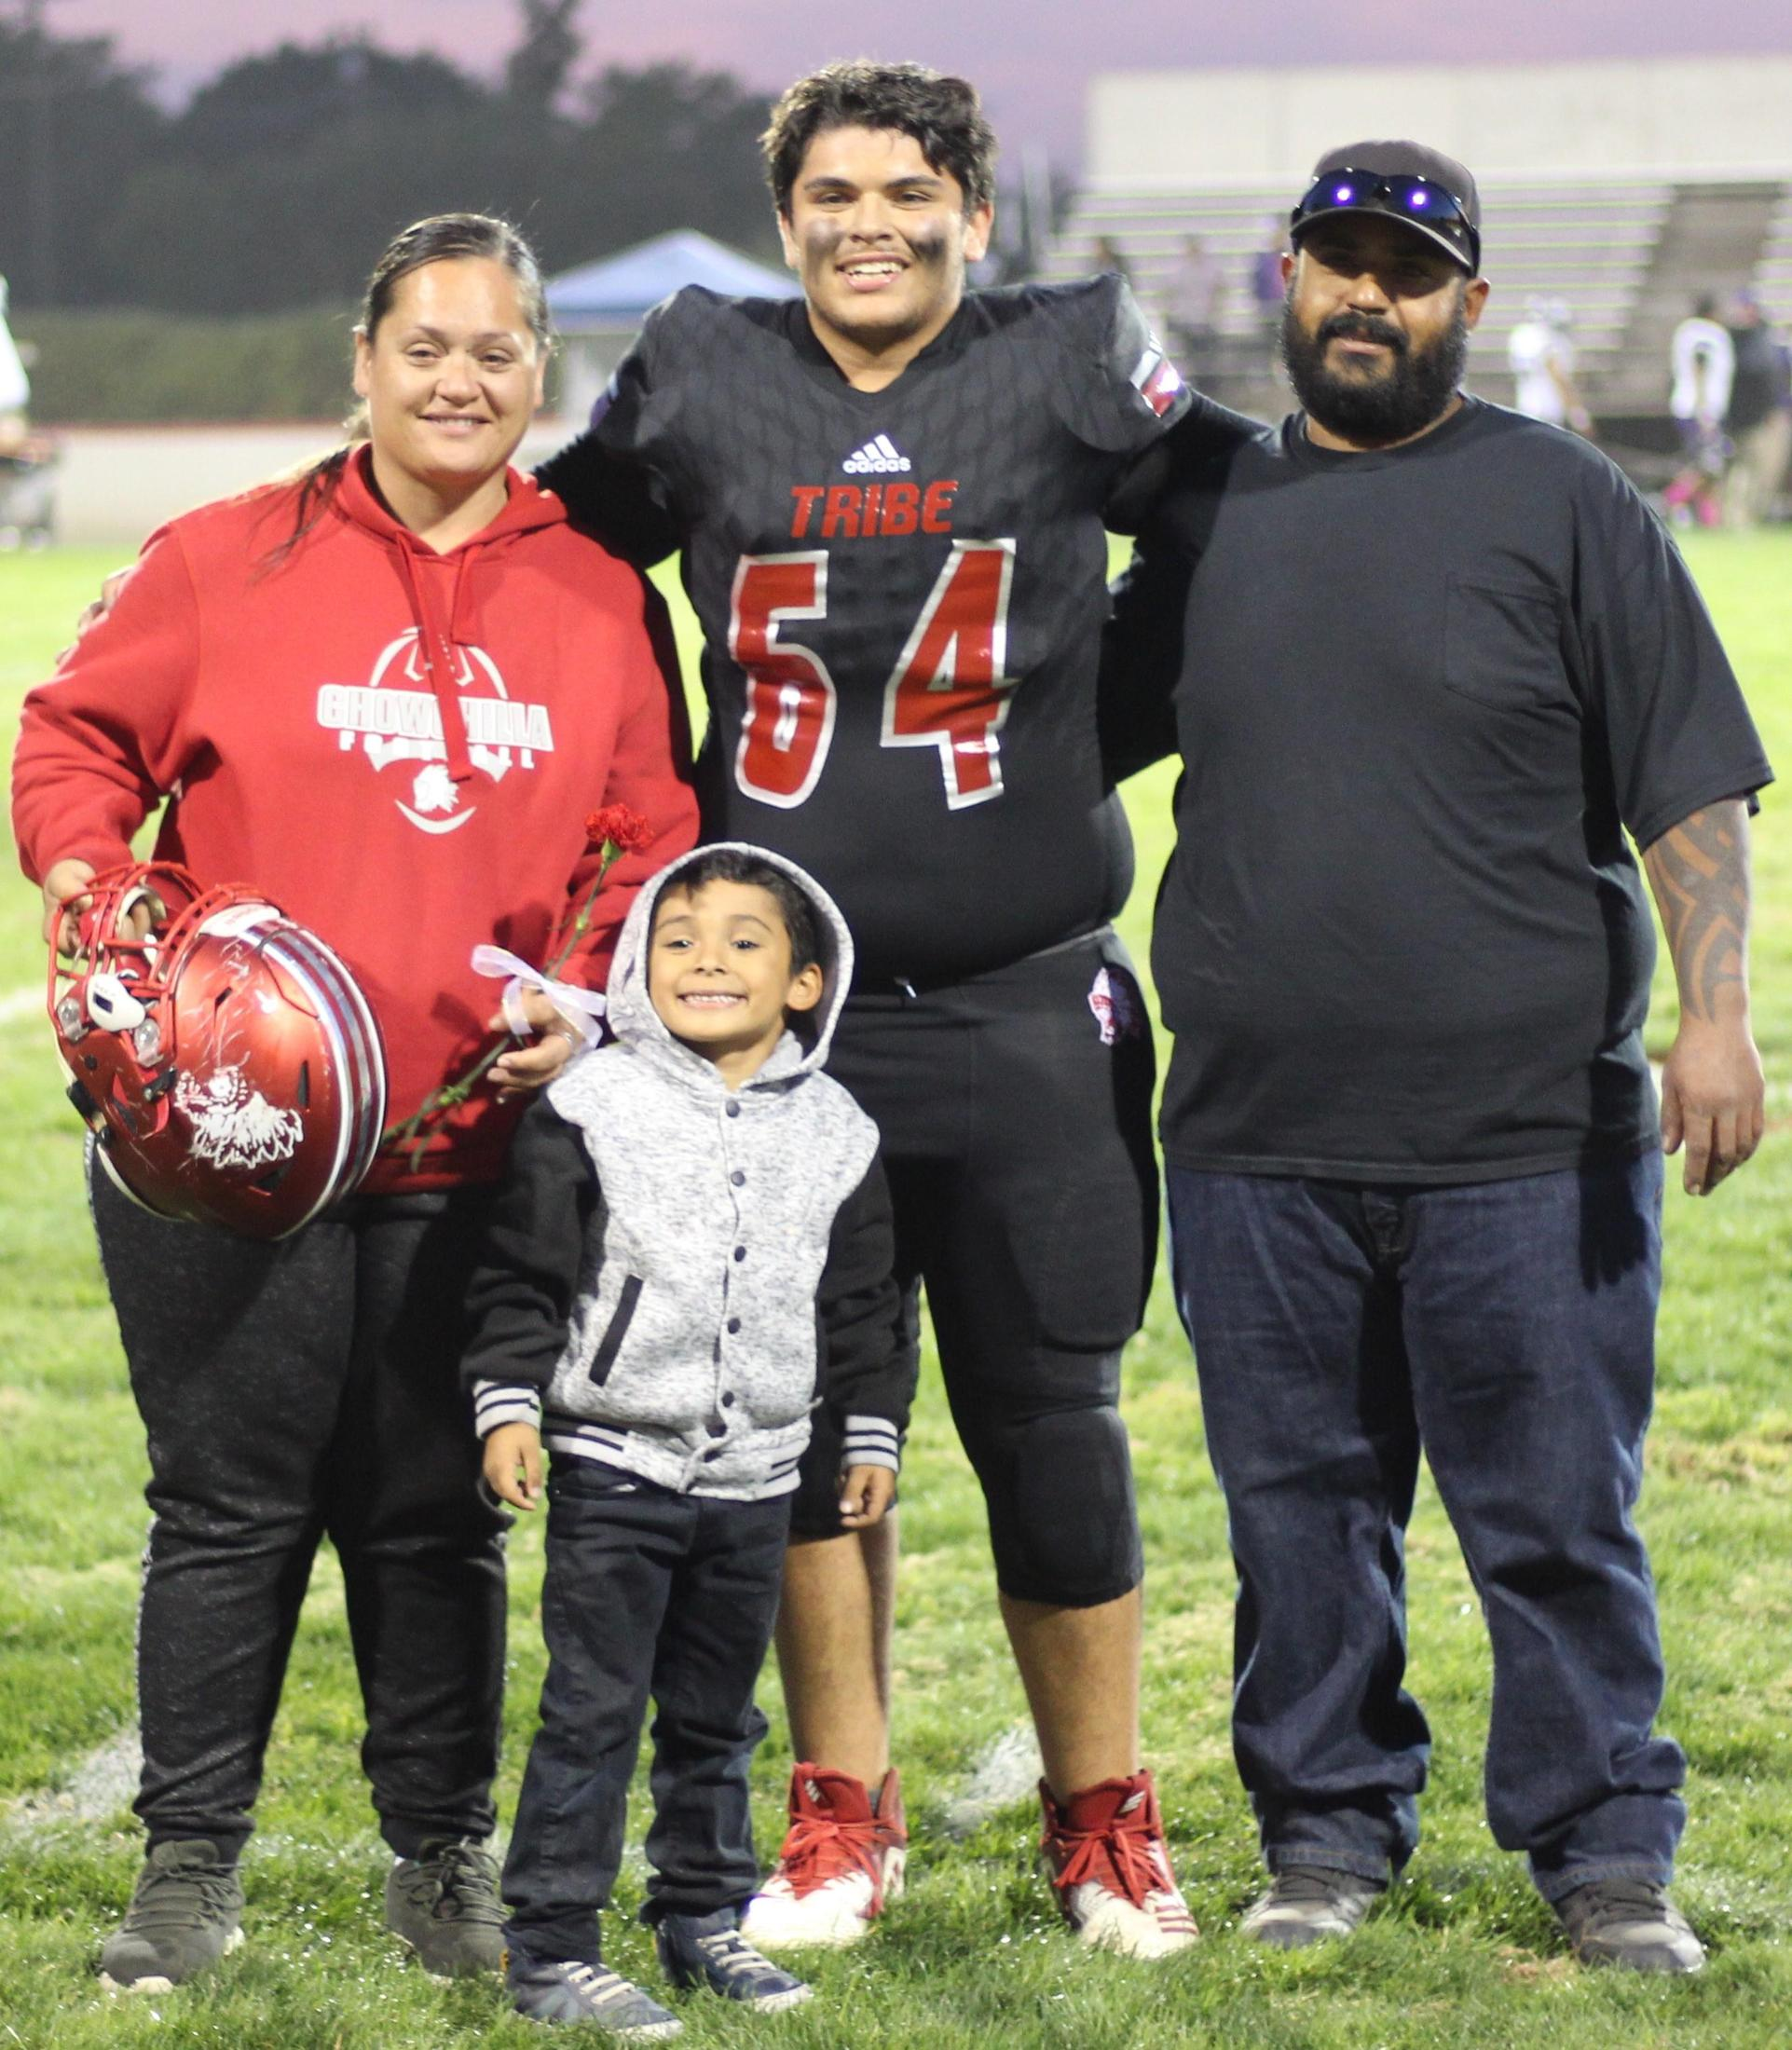 Senior football player Jacob Arteaga and his escorts.